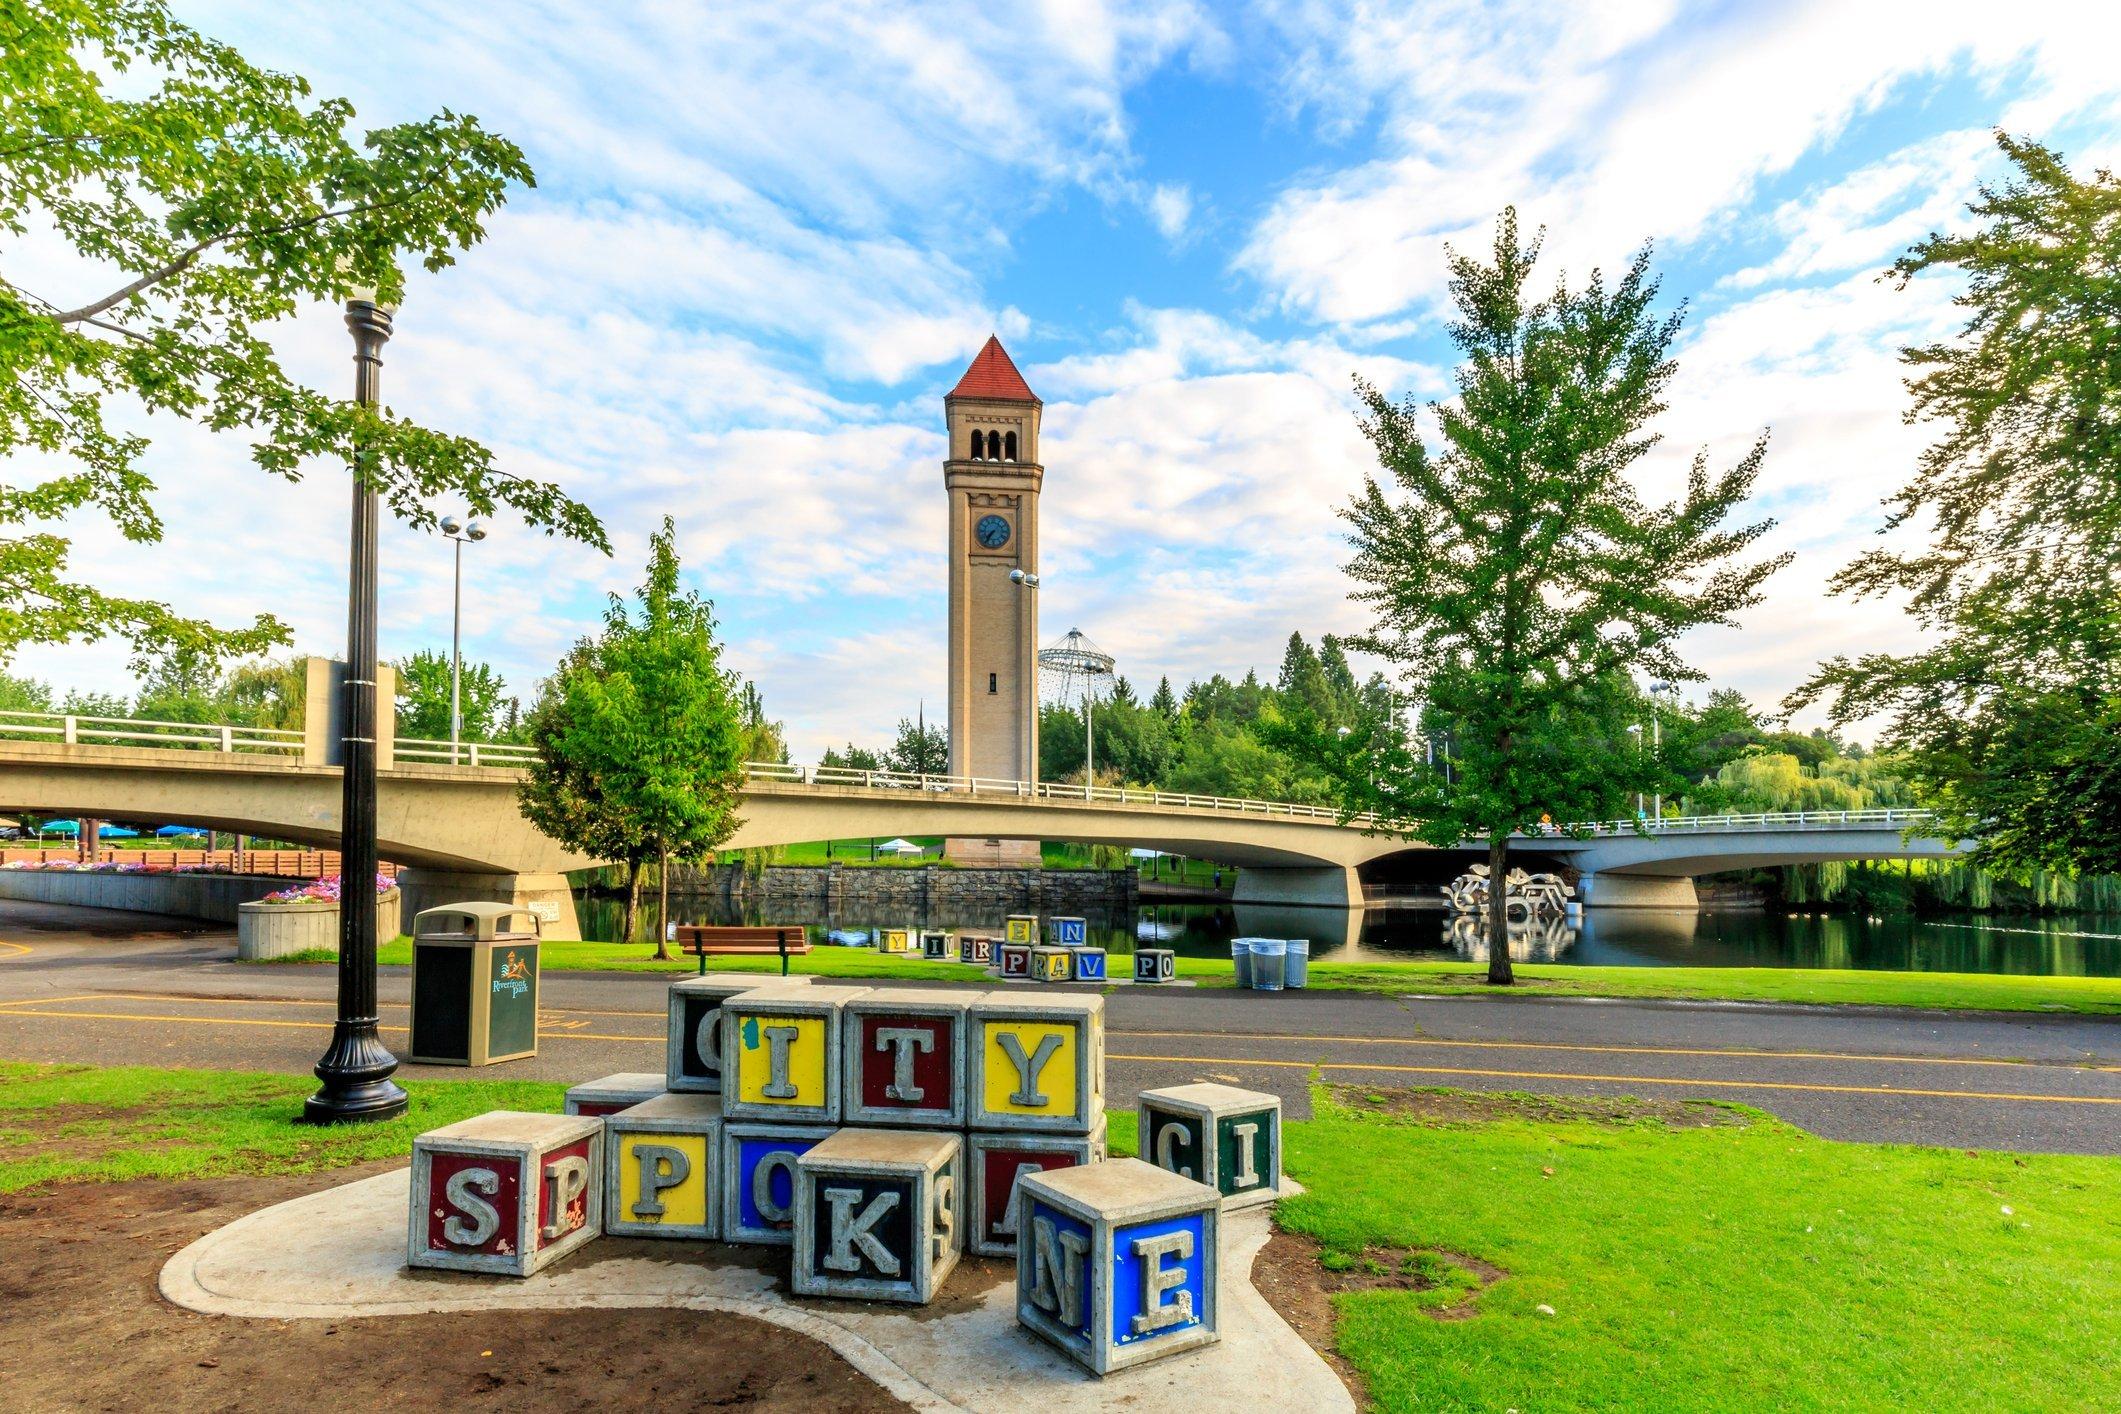 Spokane City Resources